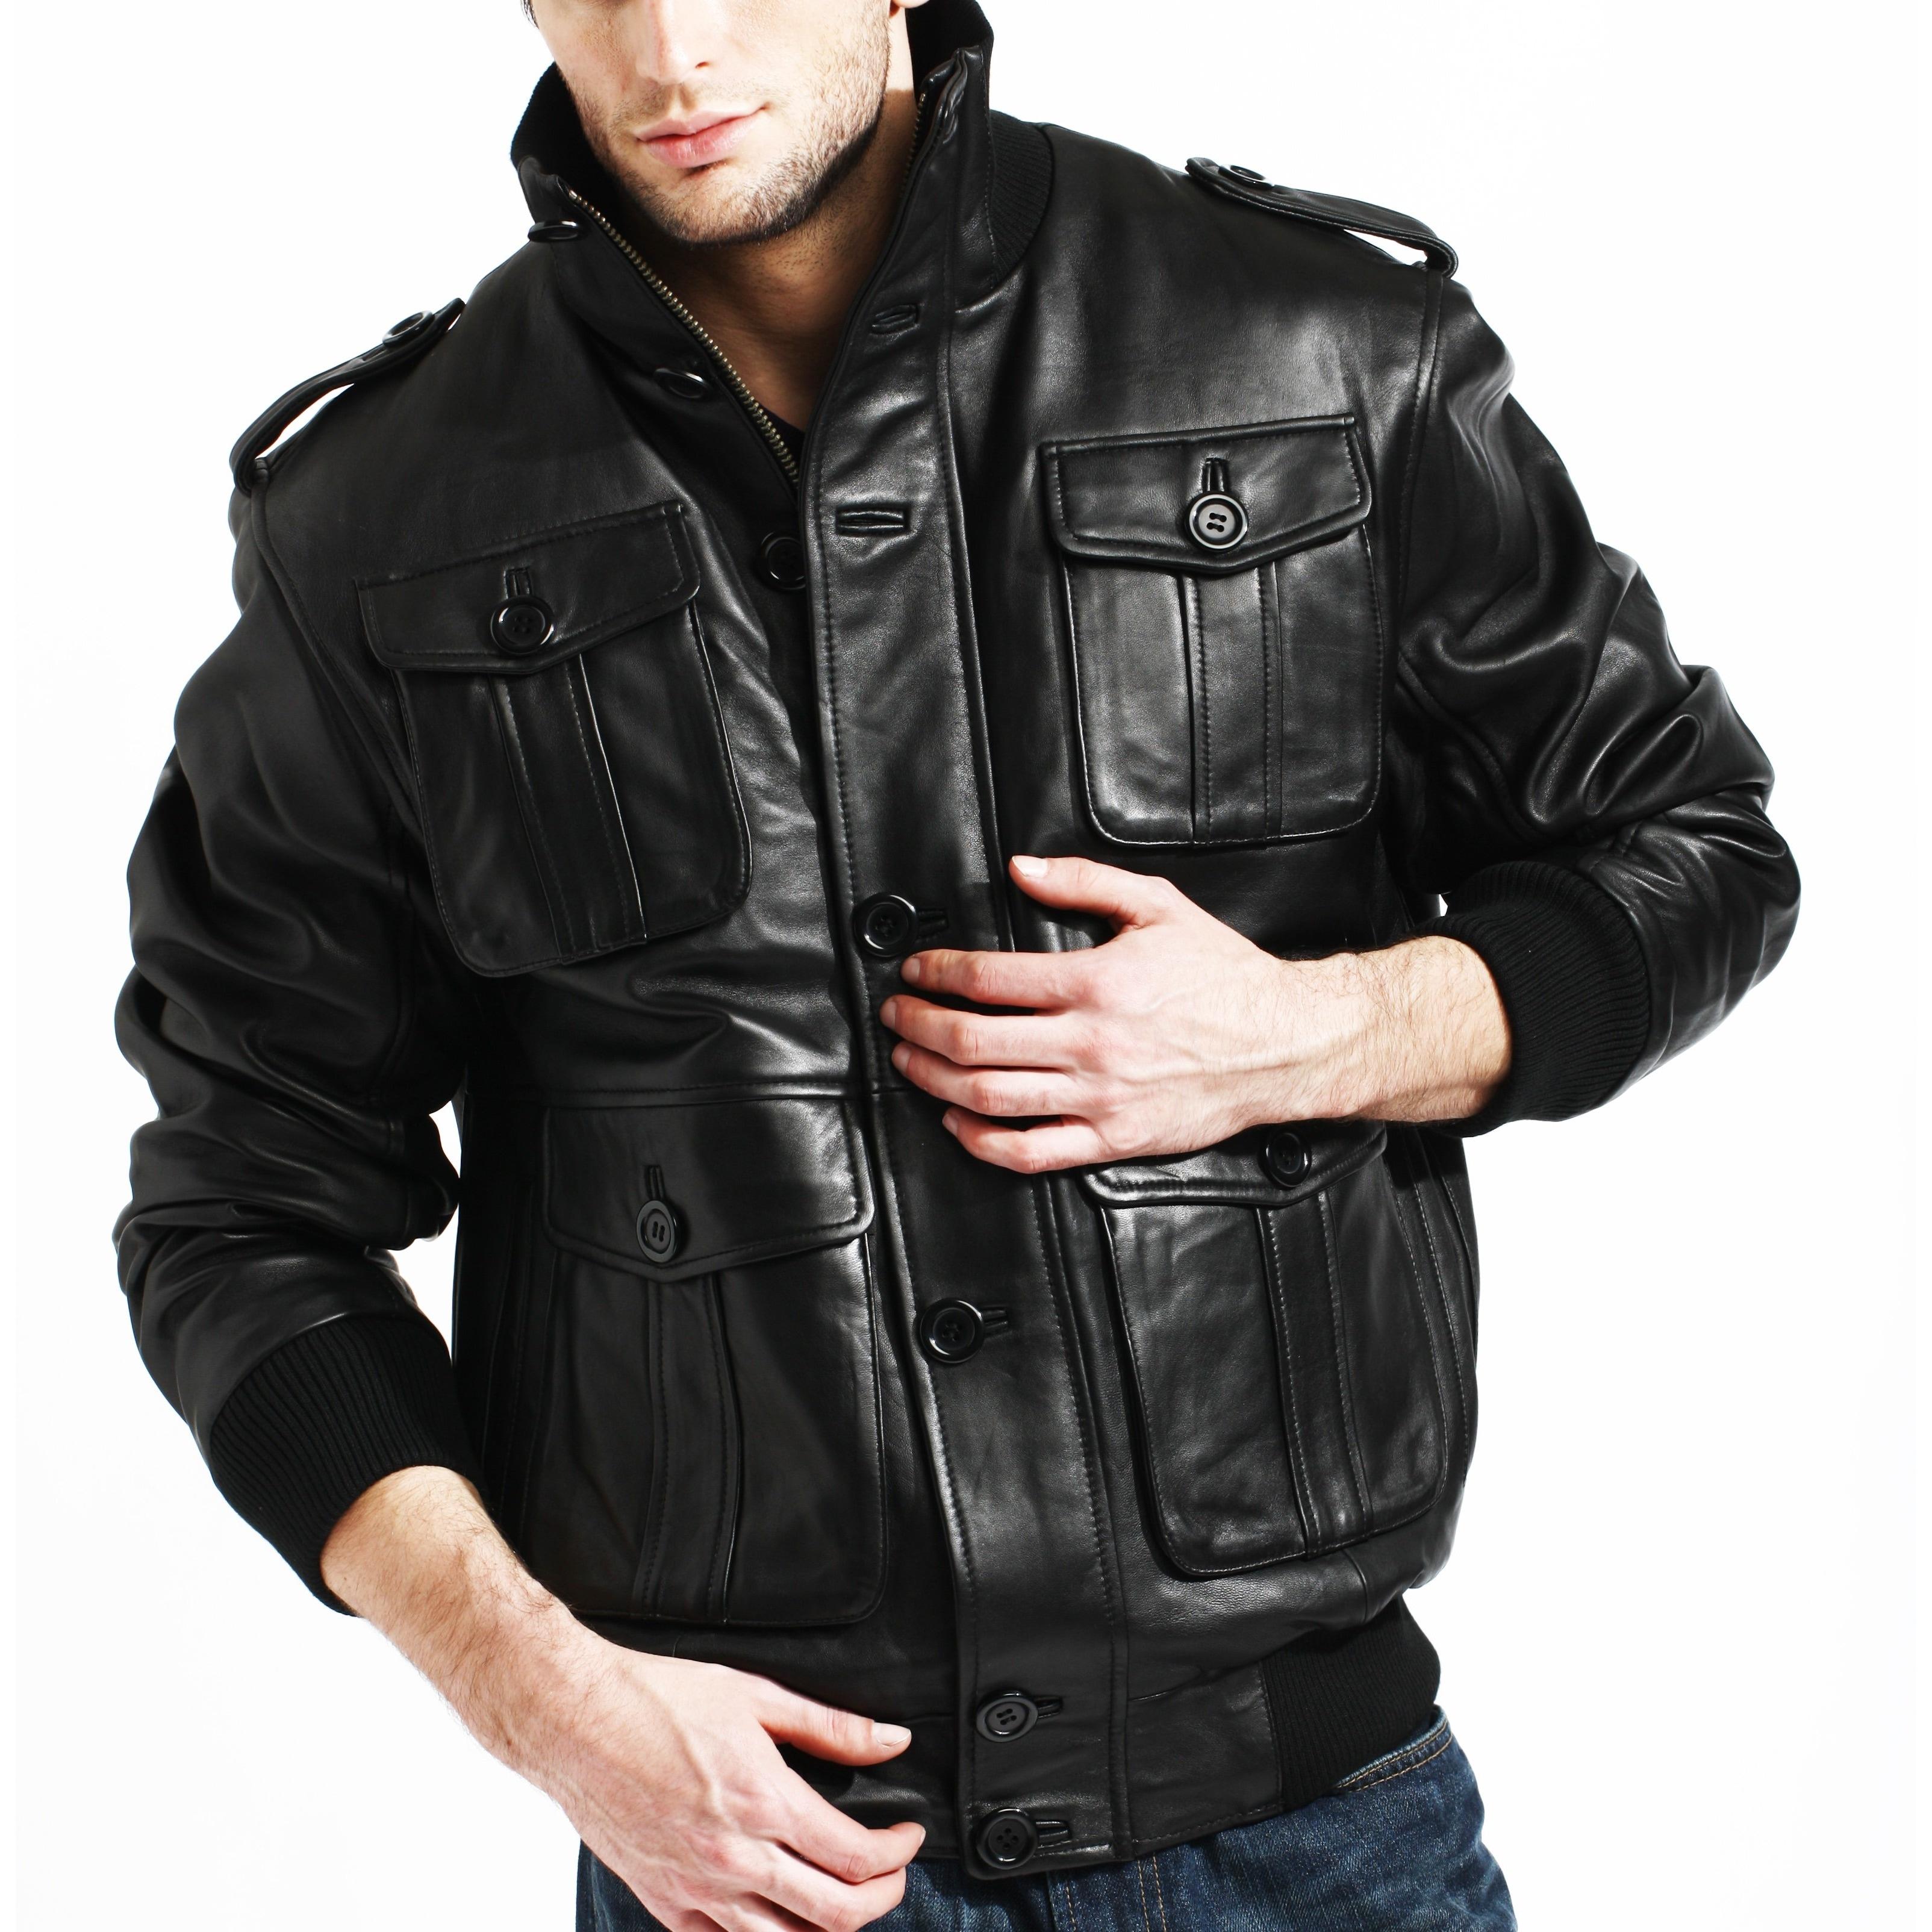 86b9a4599 Men's Black Lambskin Leather Bomber Jacket